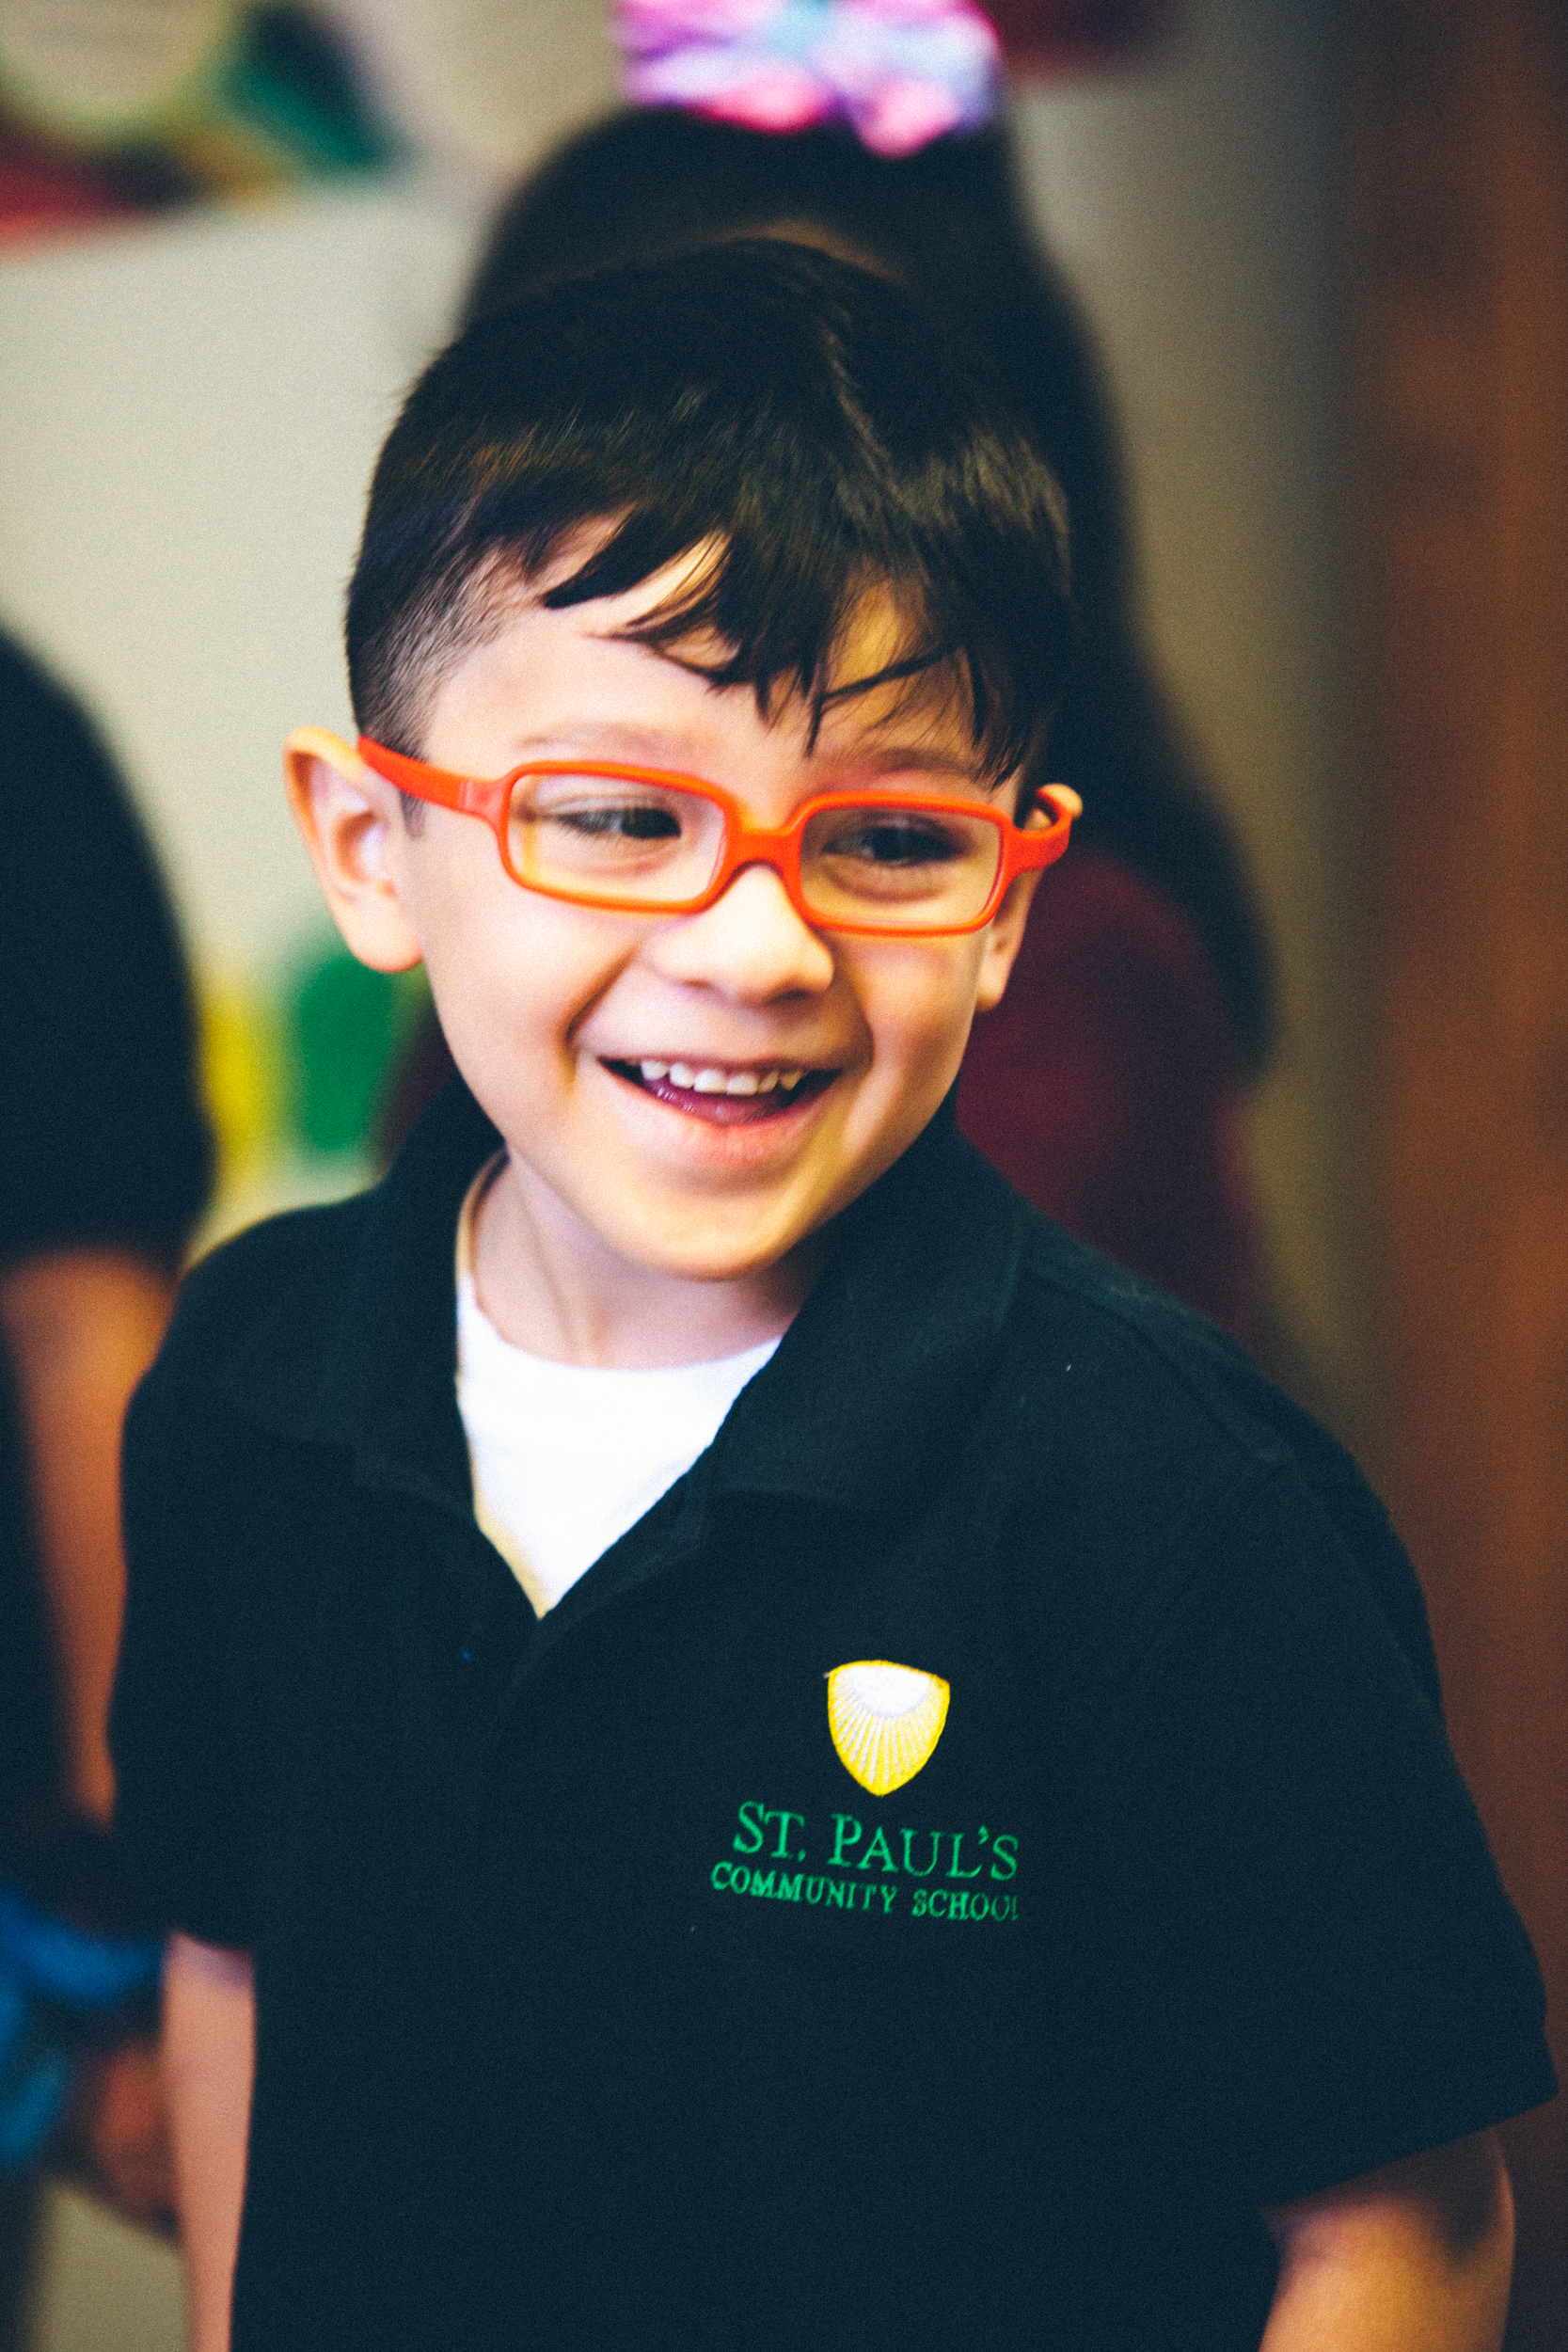 little boy with orange glasses